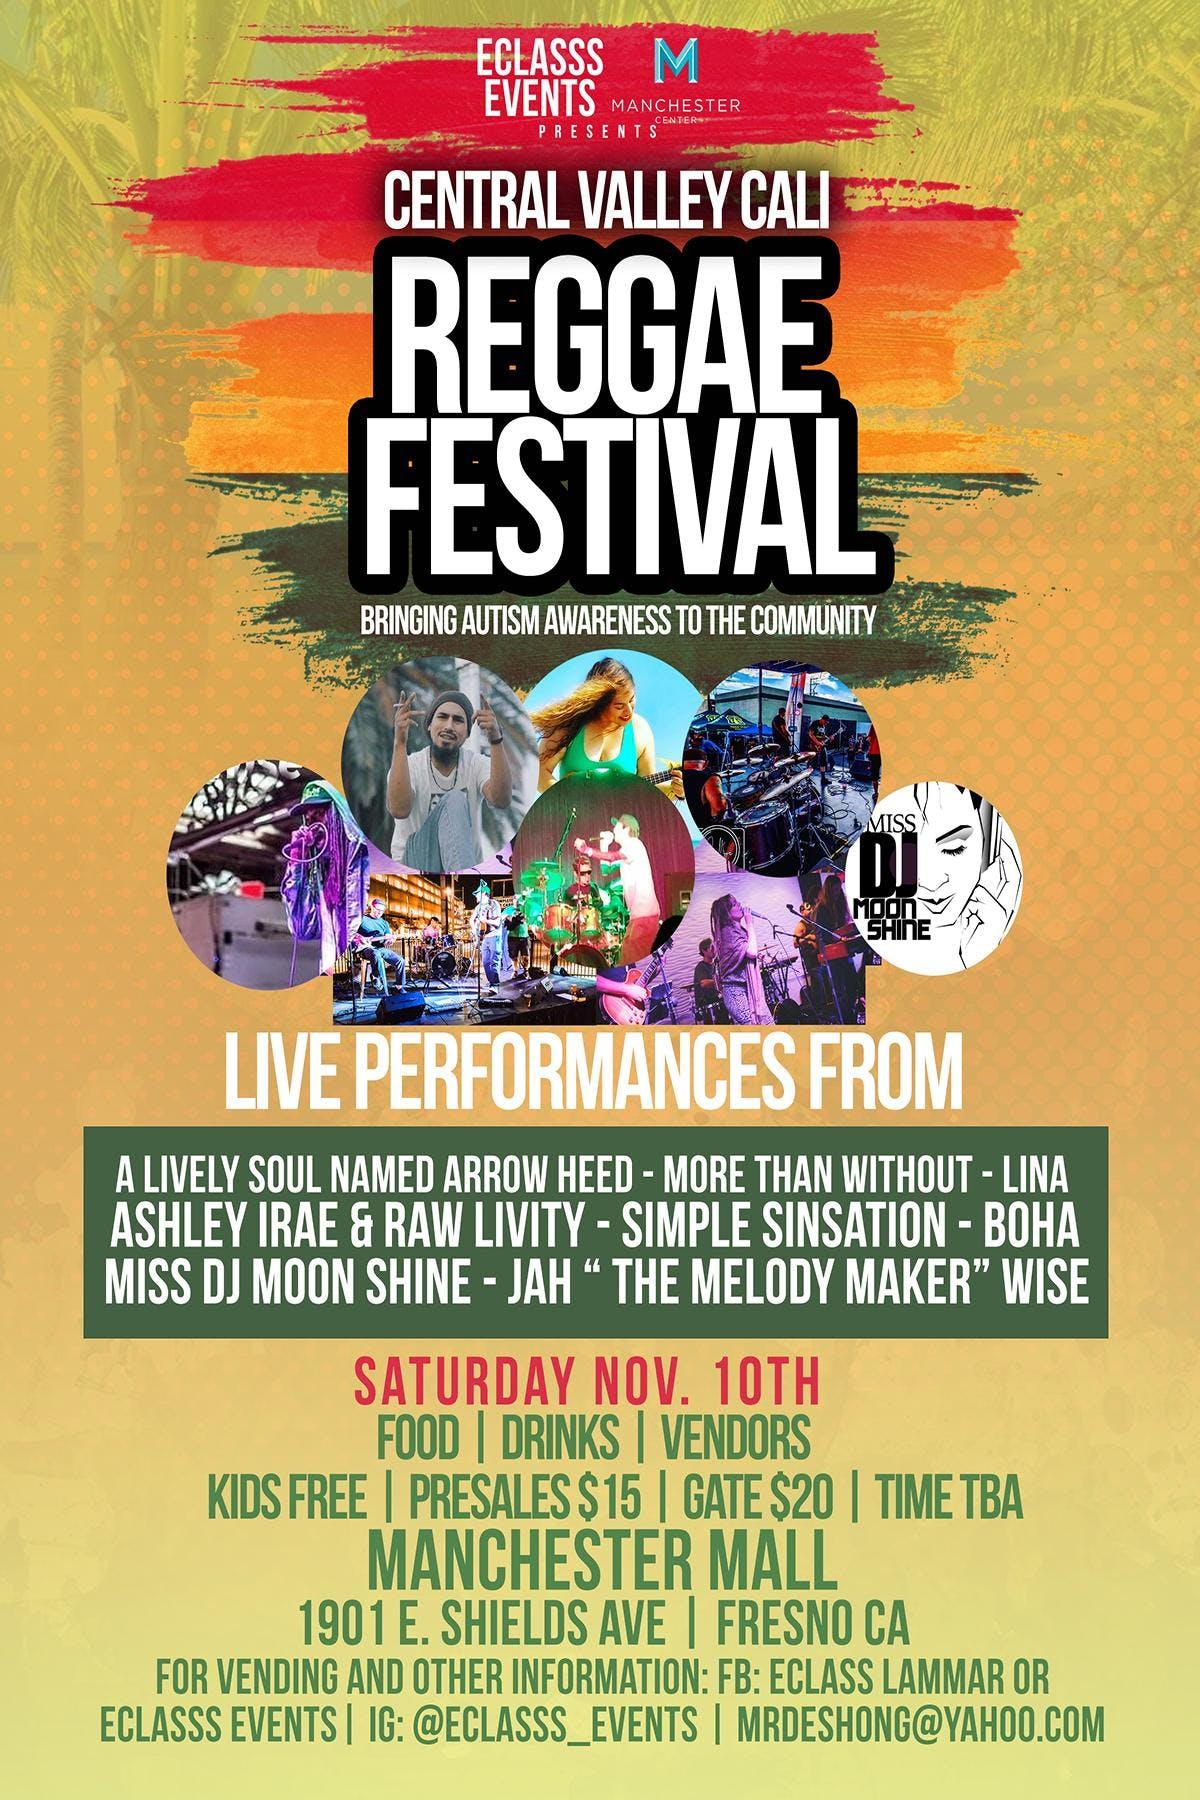 Central Valley Cali Reggae Festival bringing